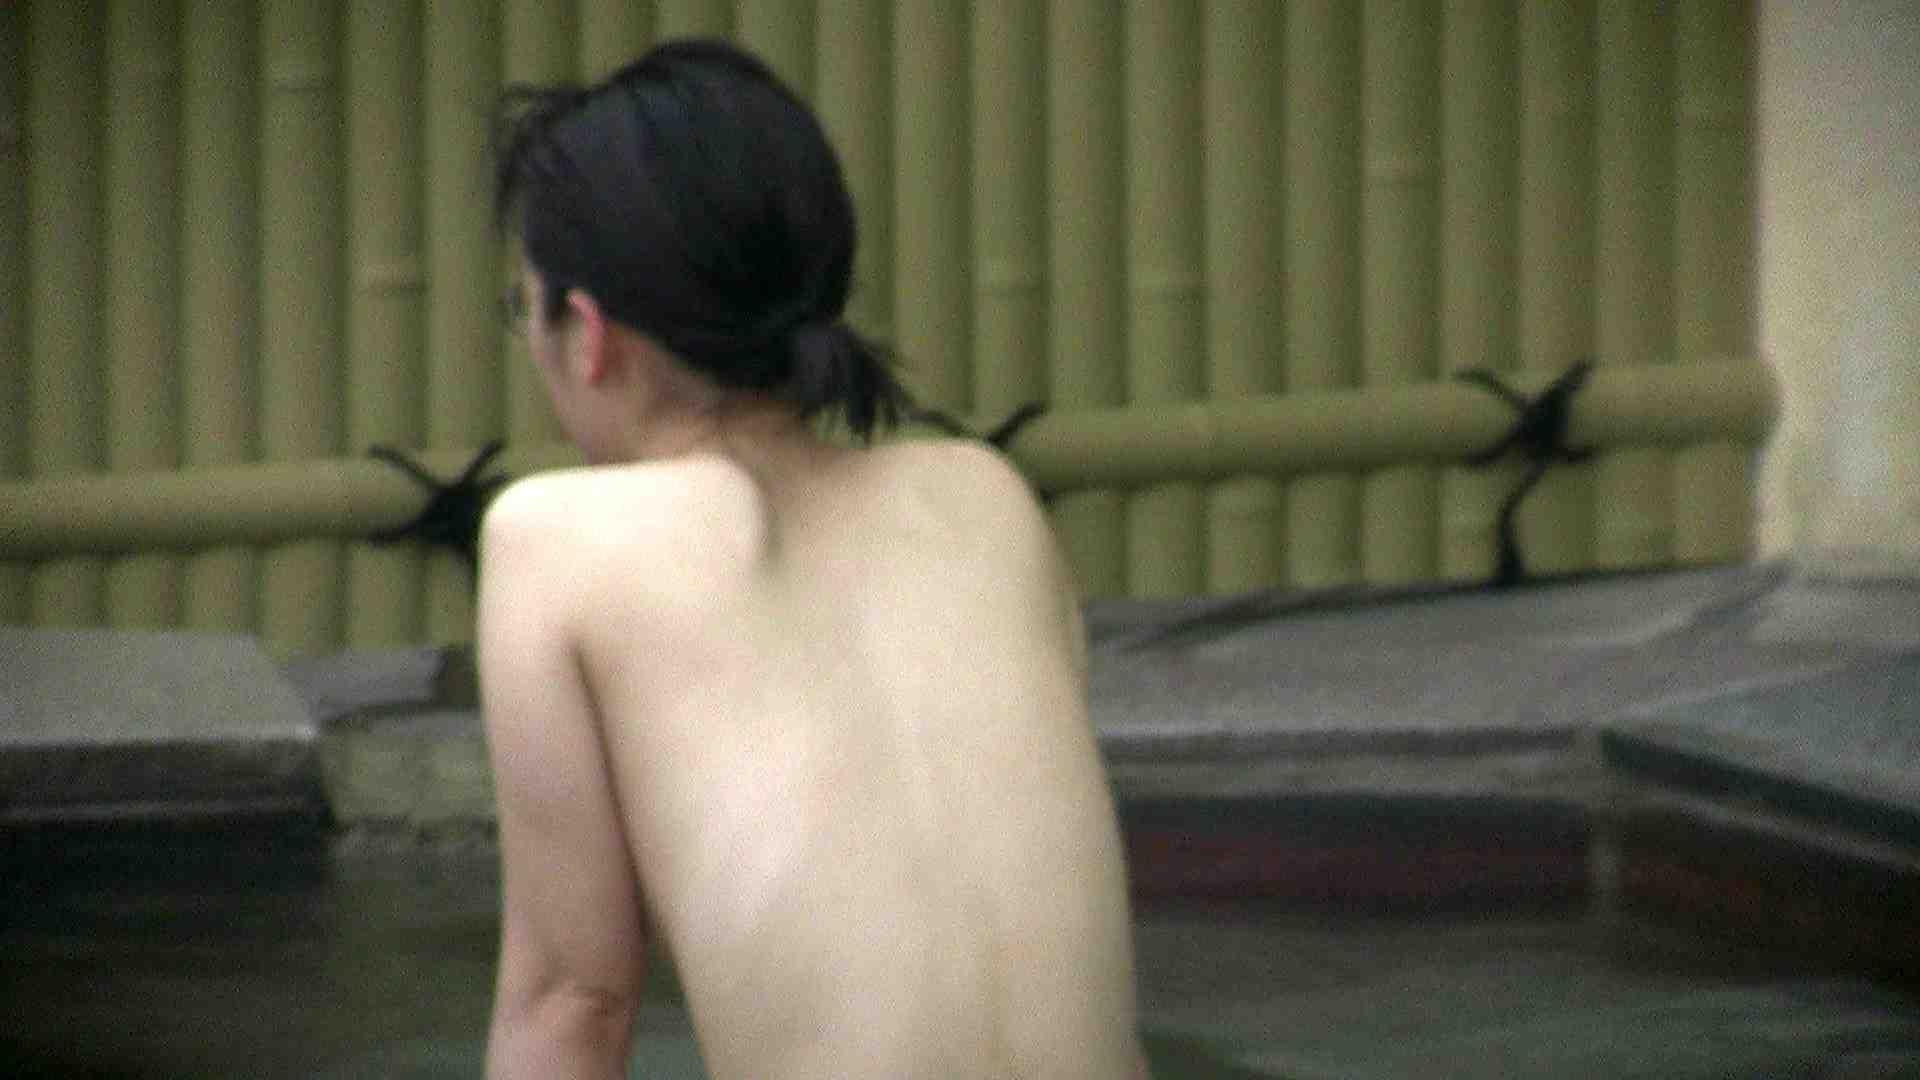 Aquaな露天風呂Vol.684 盗撮 アダルト動画キャプチャ 59連発 56